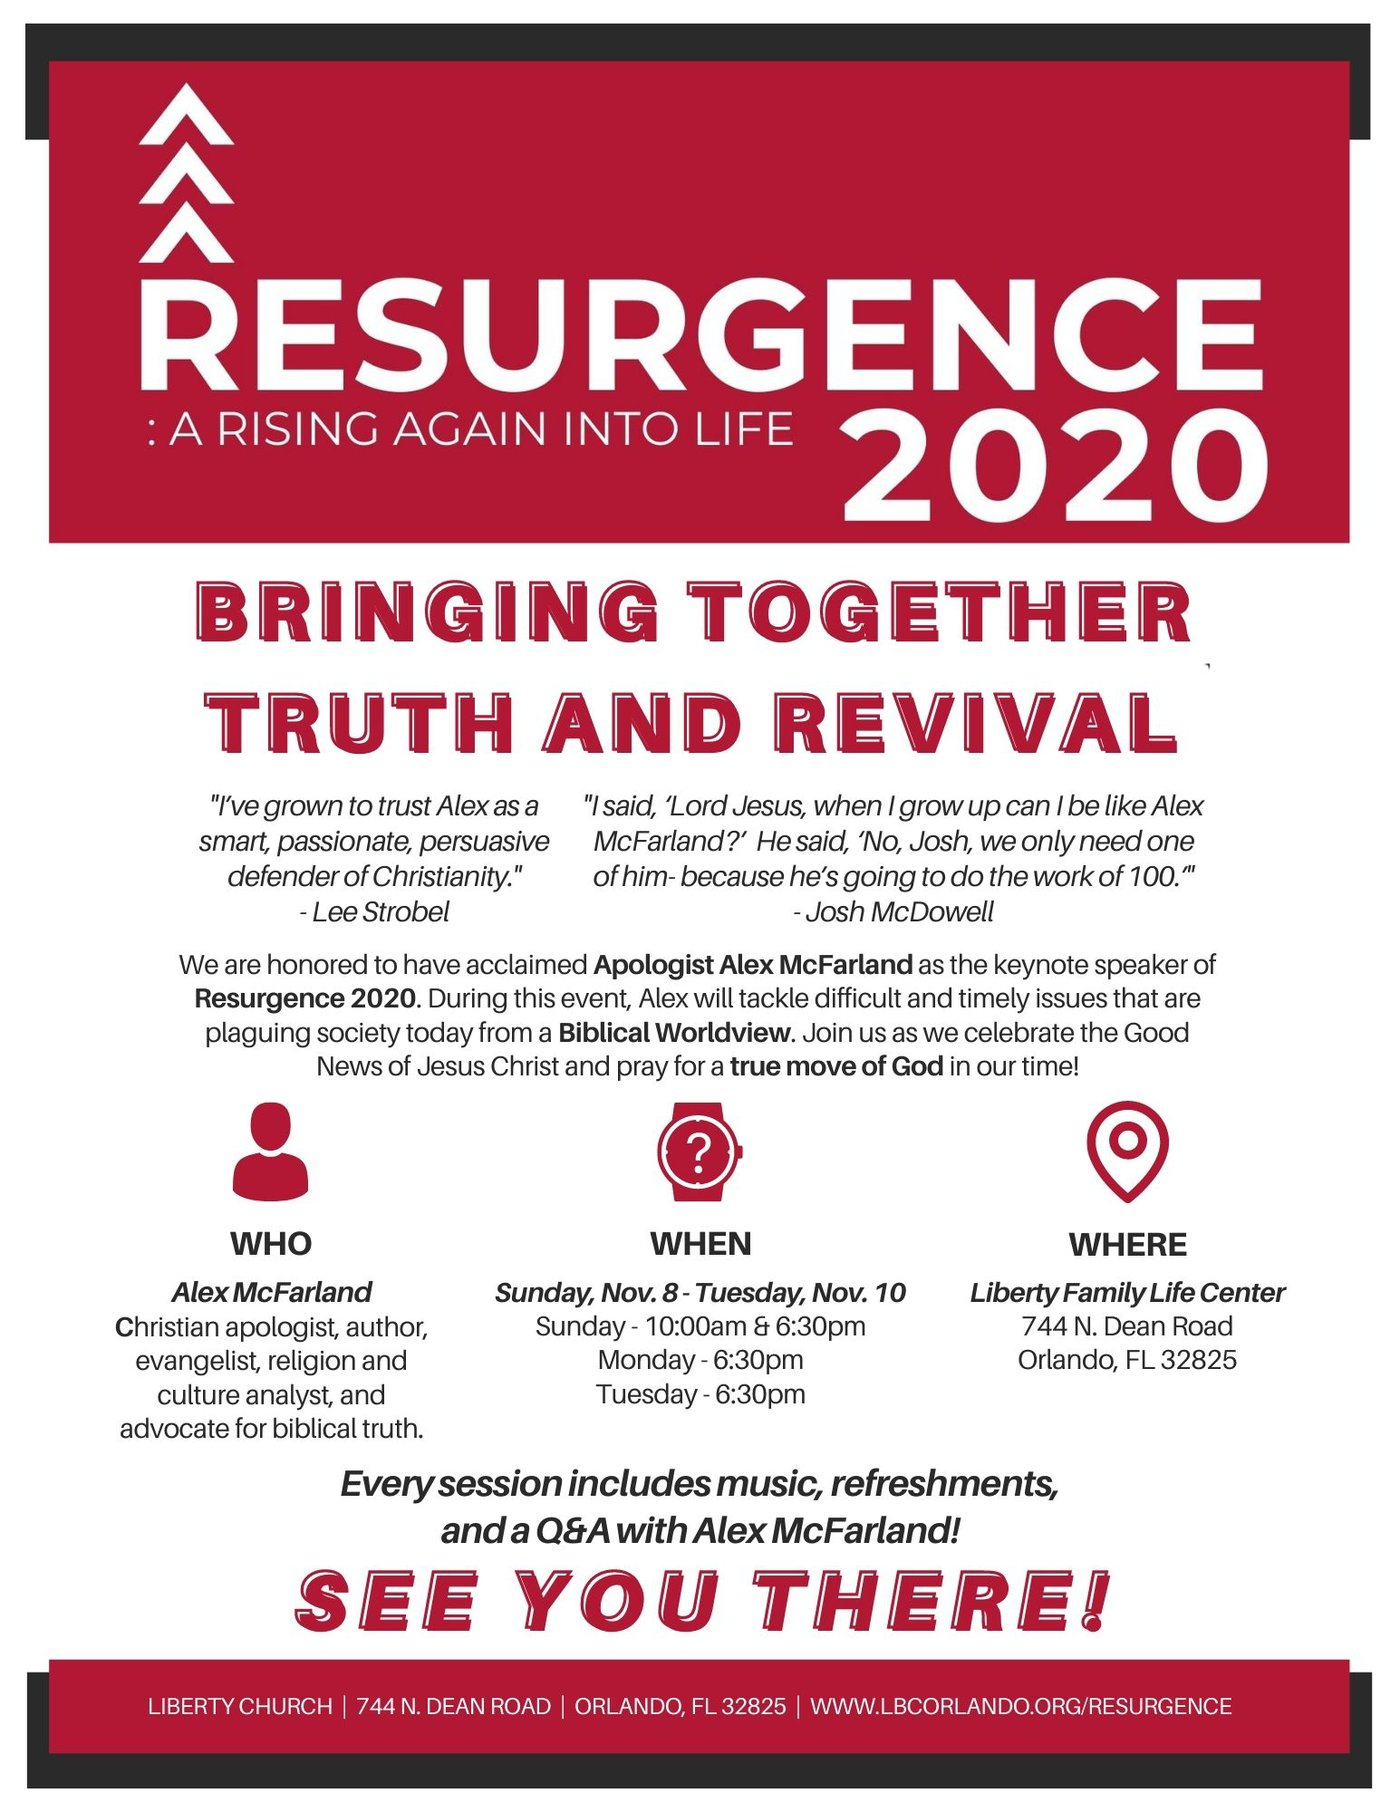 Resurgence 2020